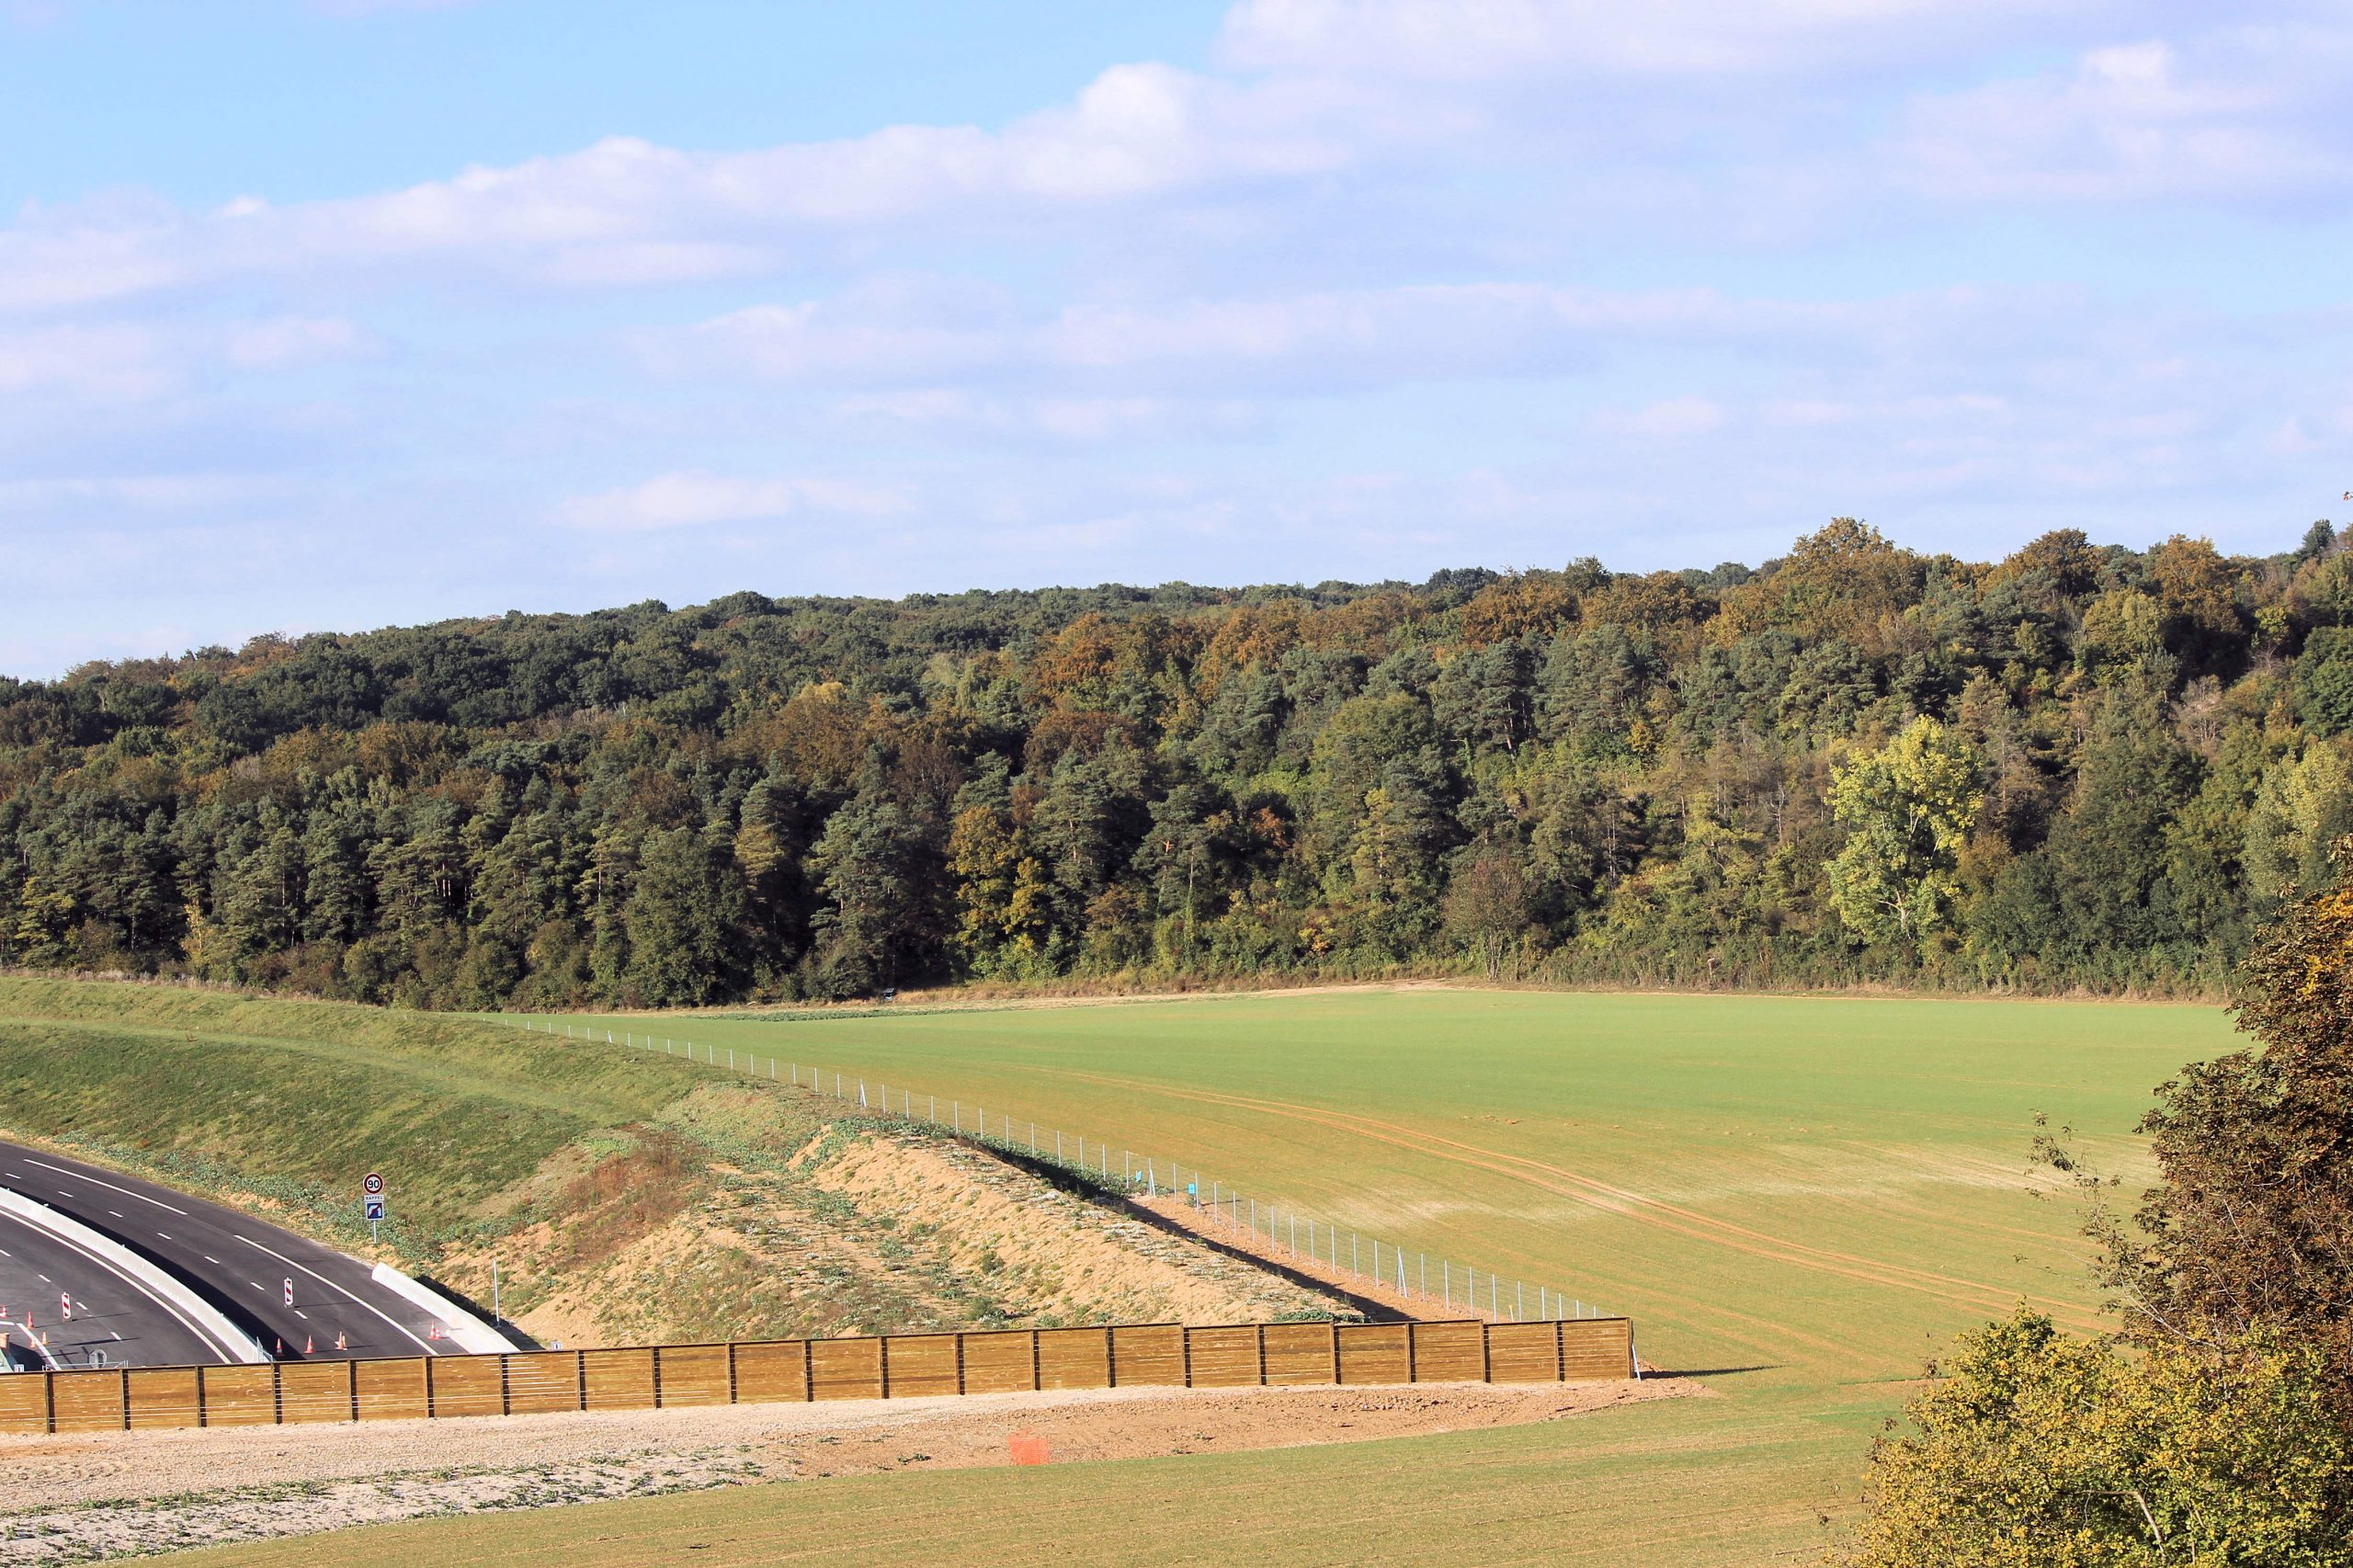 maillard paysage clôture route